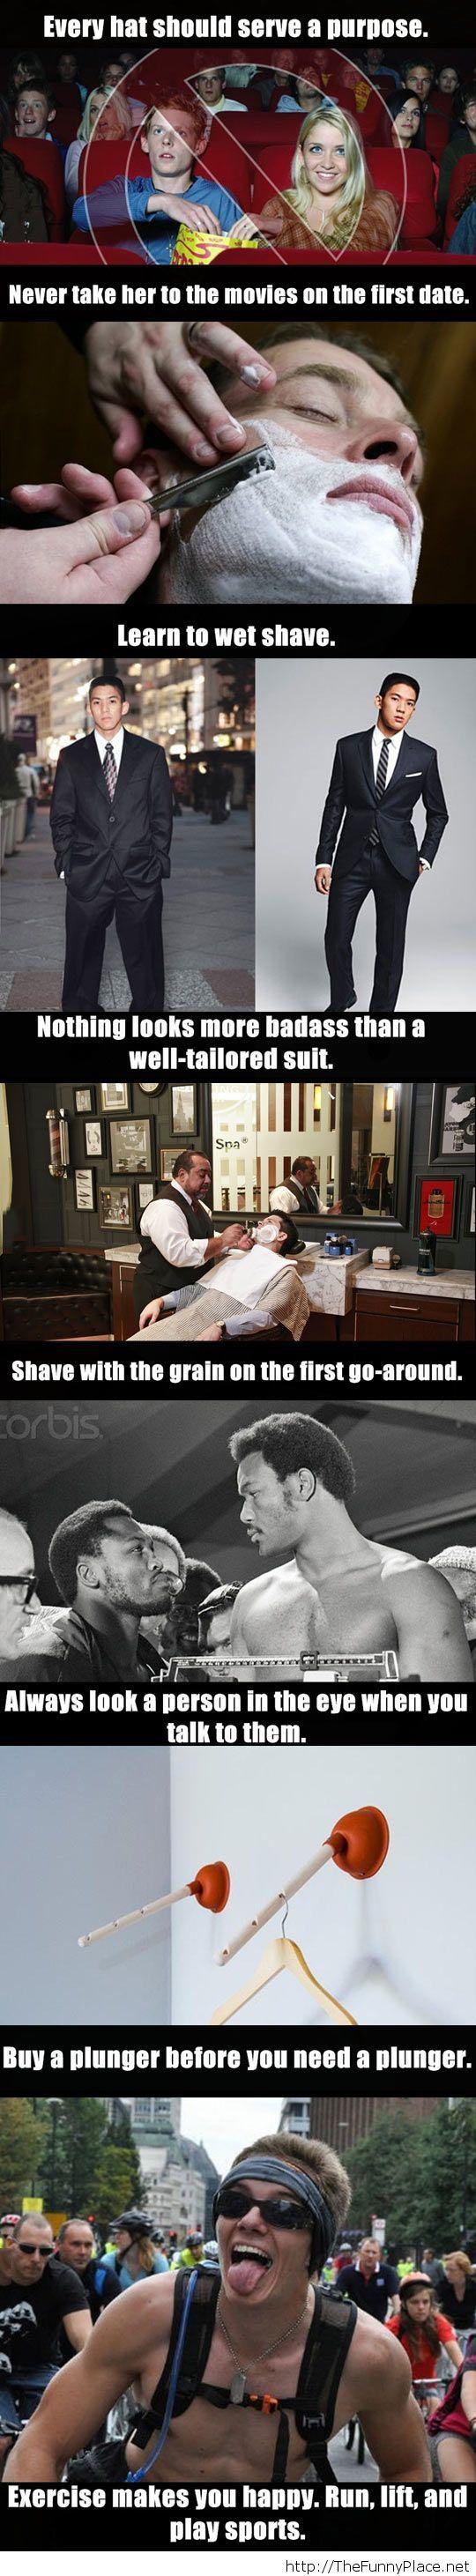 Great tips for men